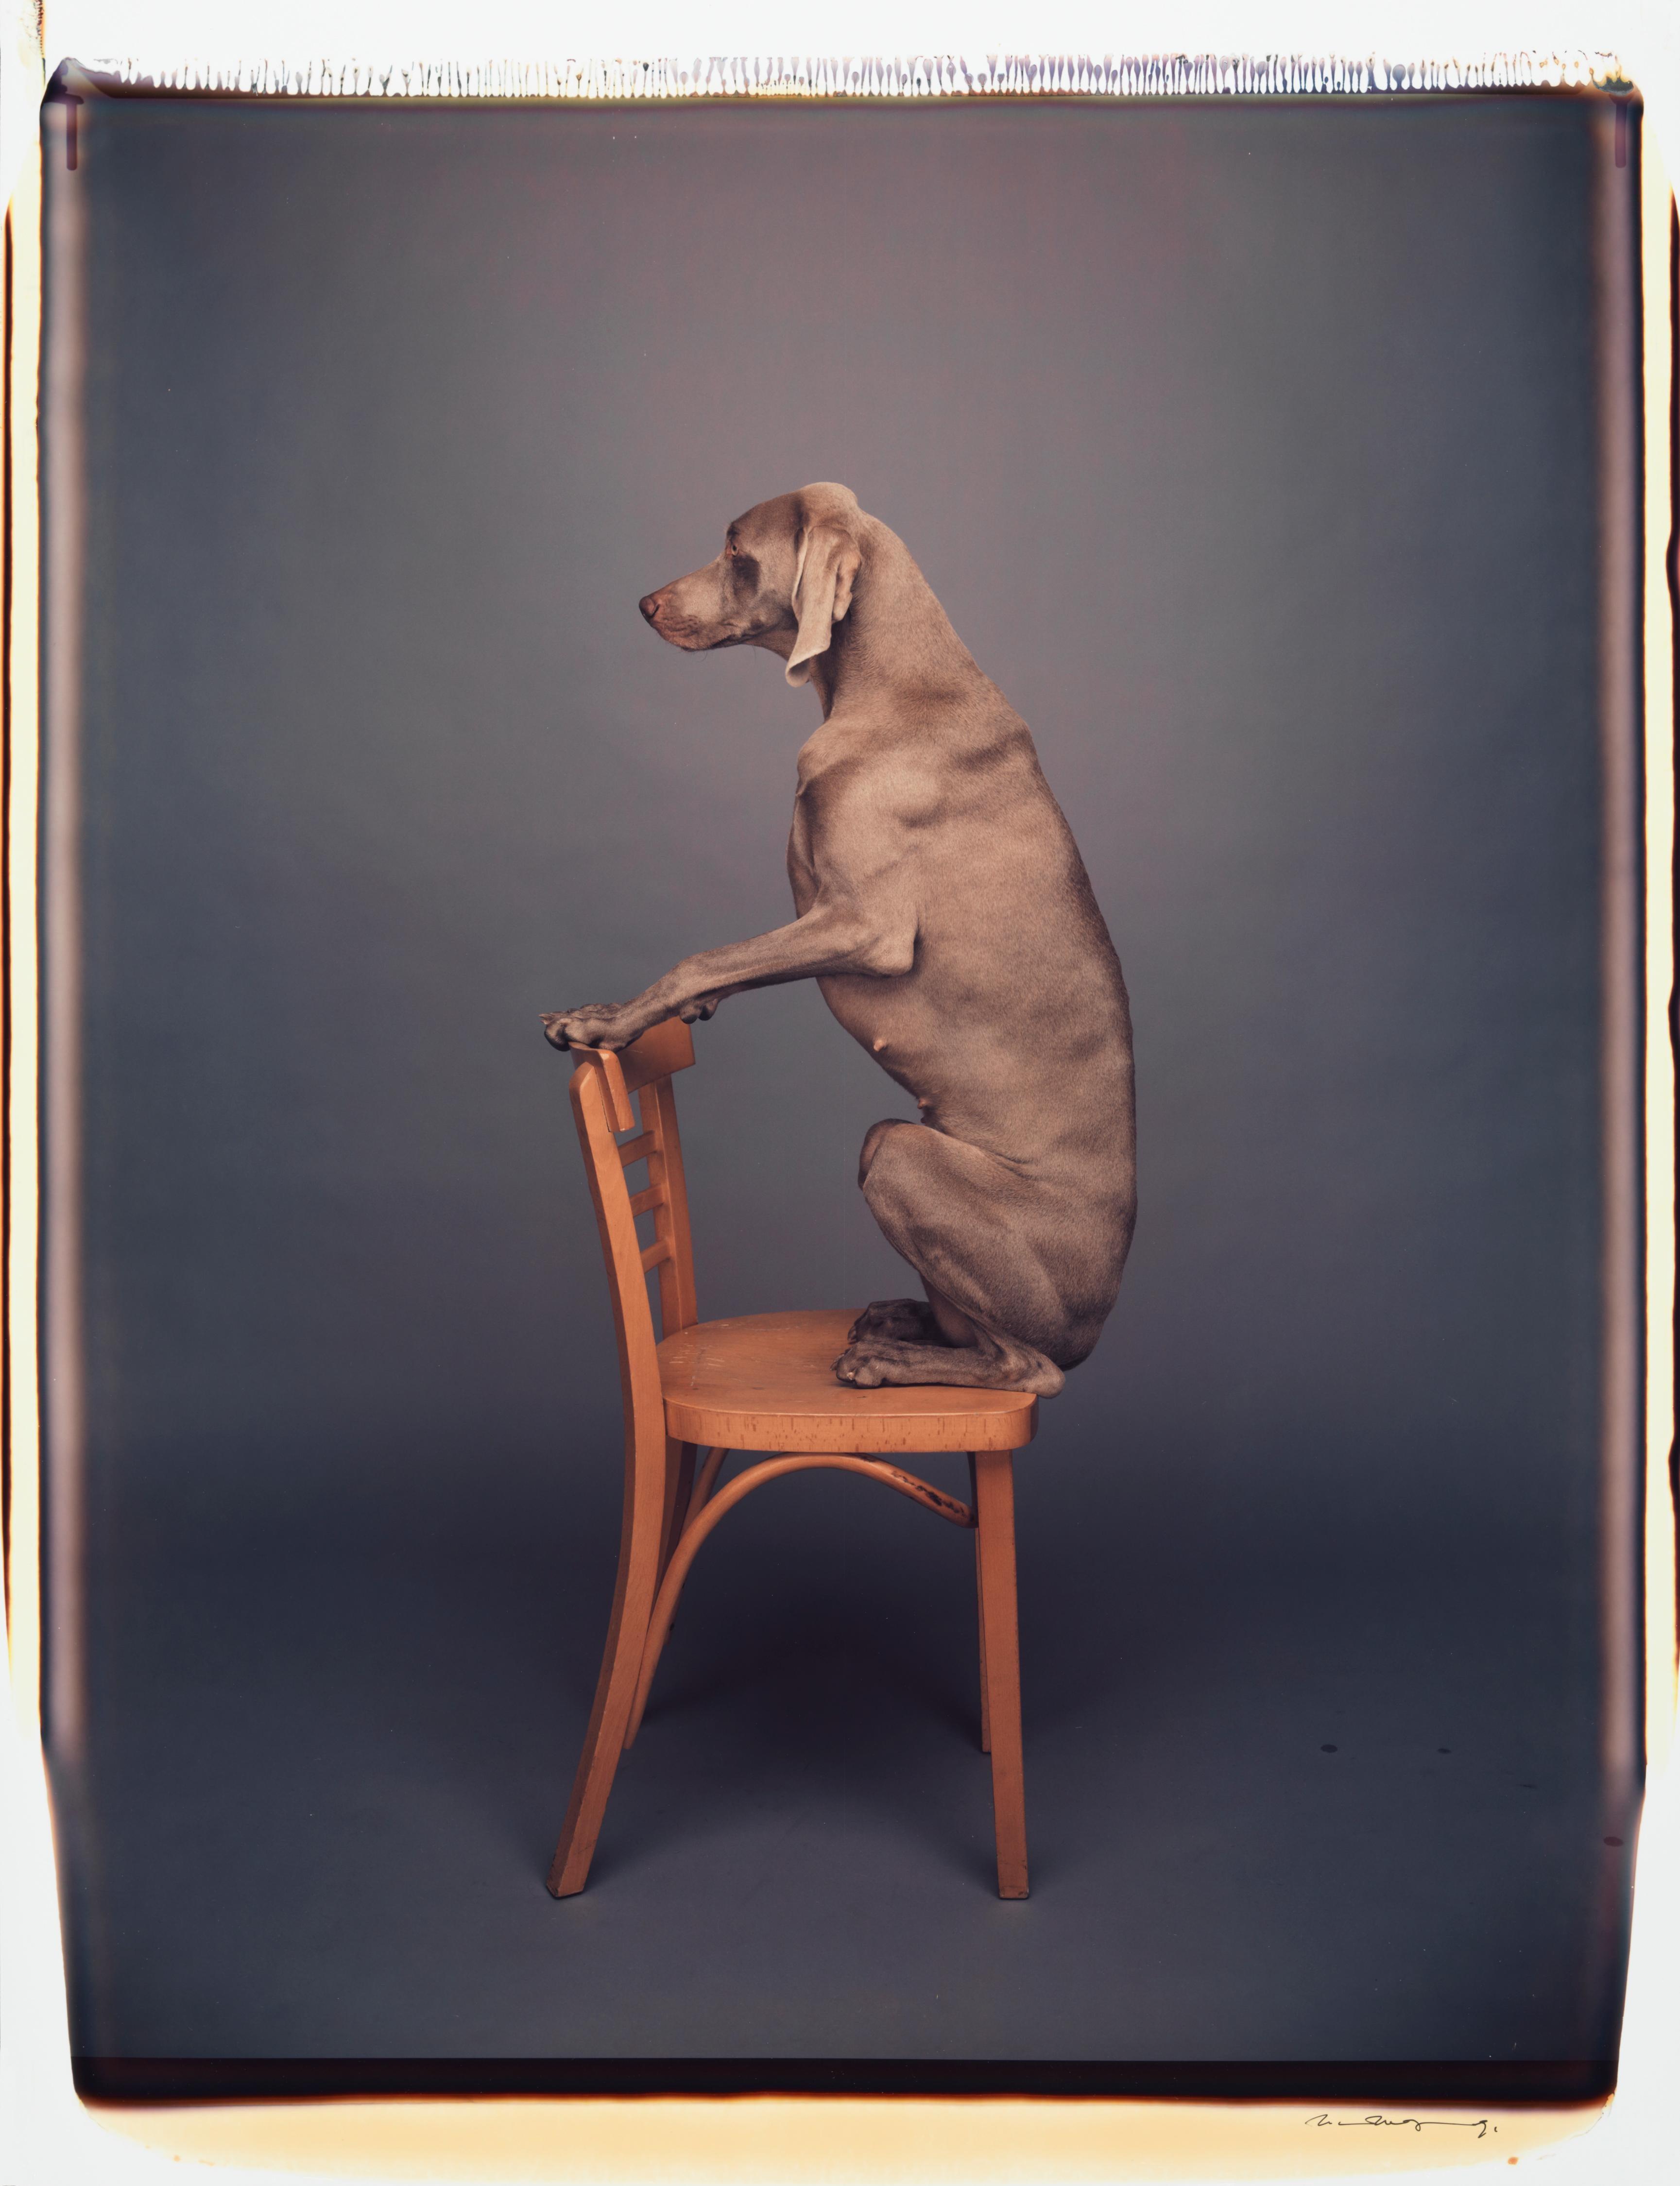 Chair Piece - William Wegman (Colour Photography)